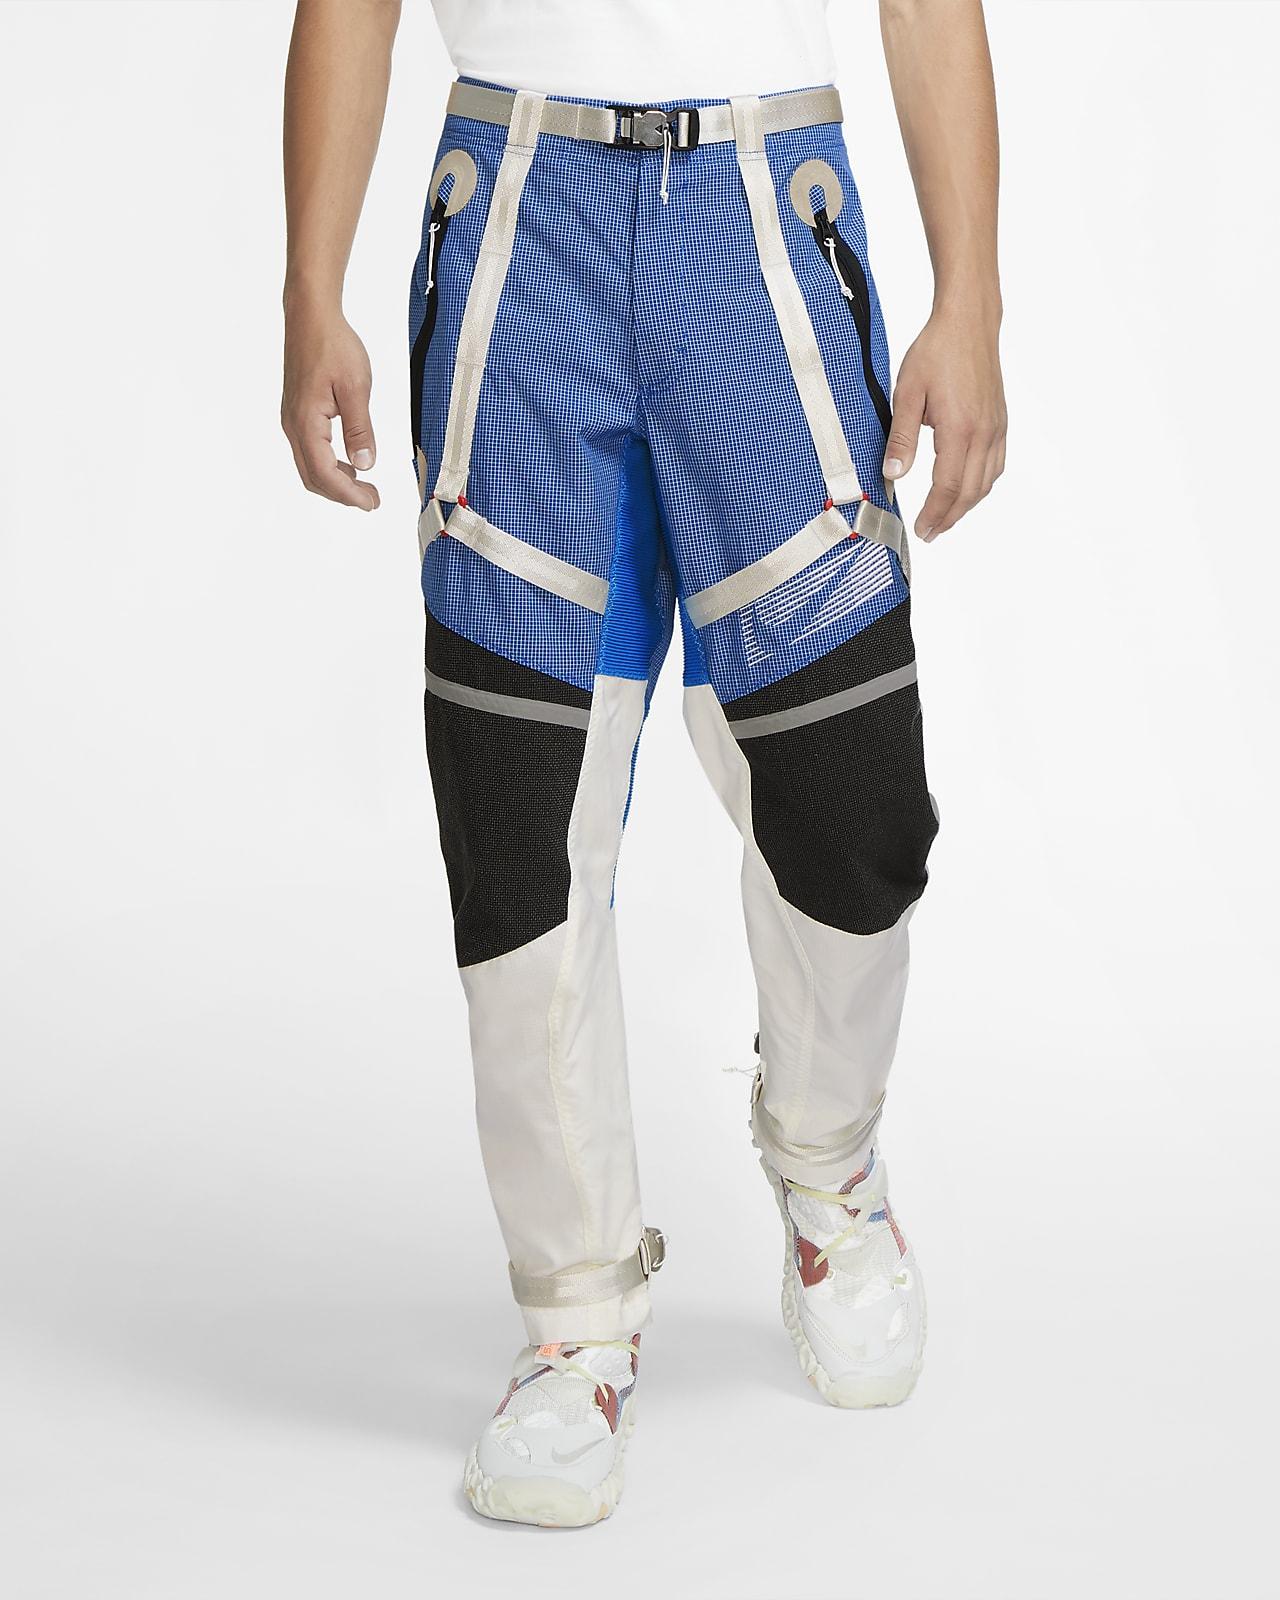 Pantaloni Nike ISPA